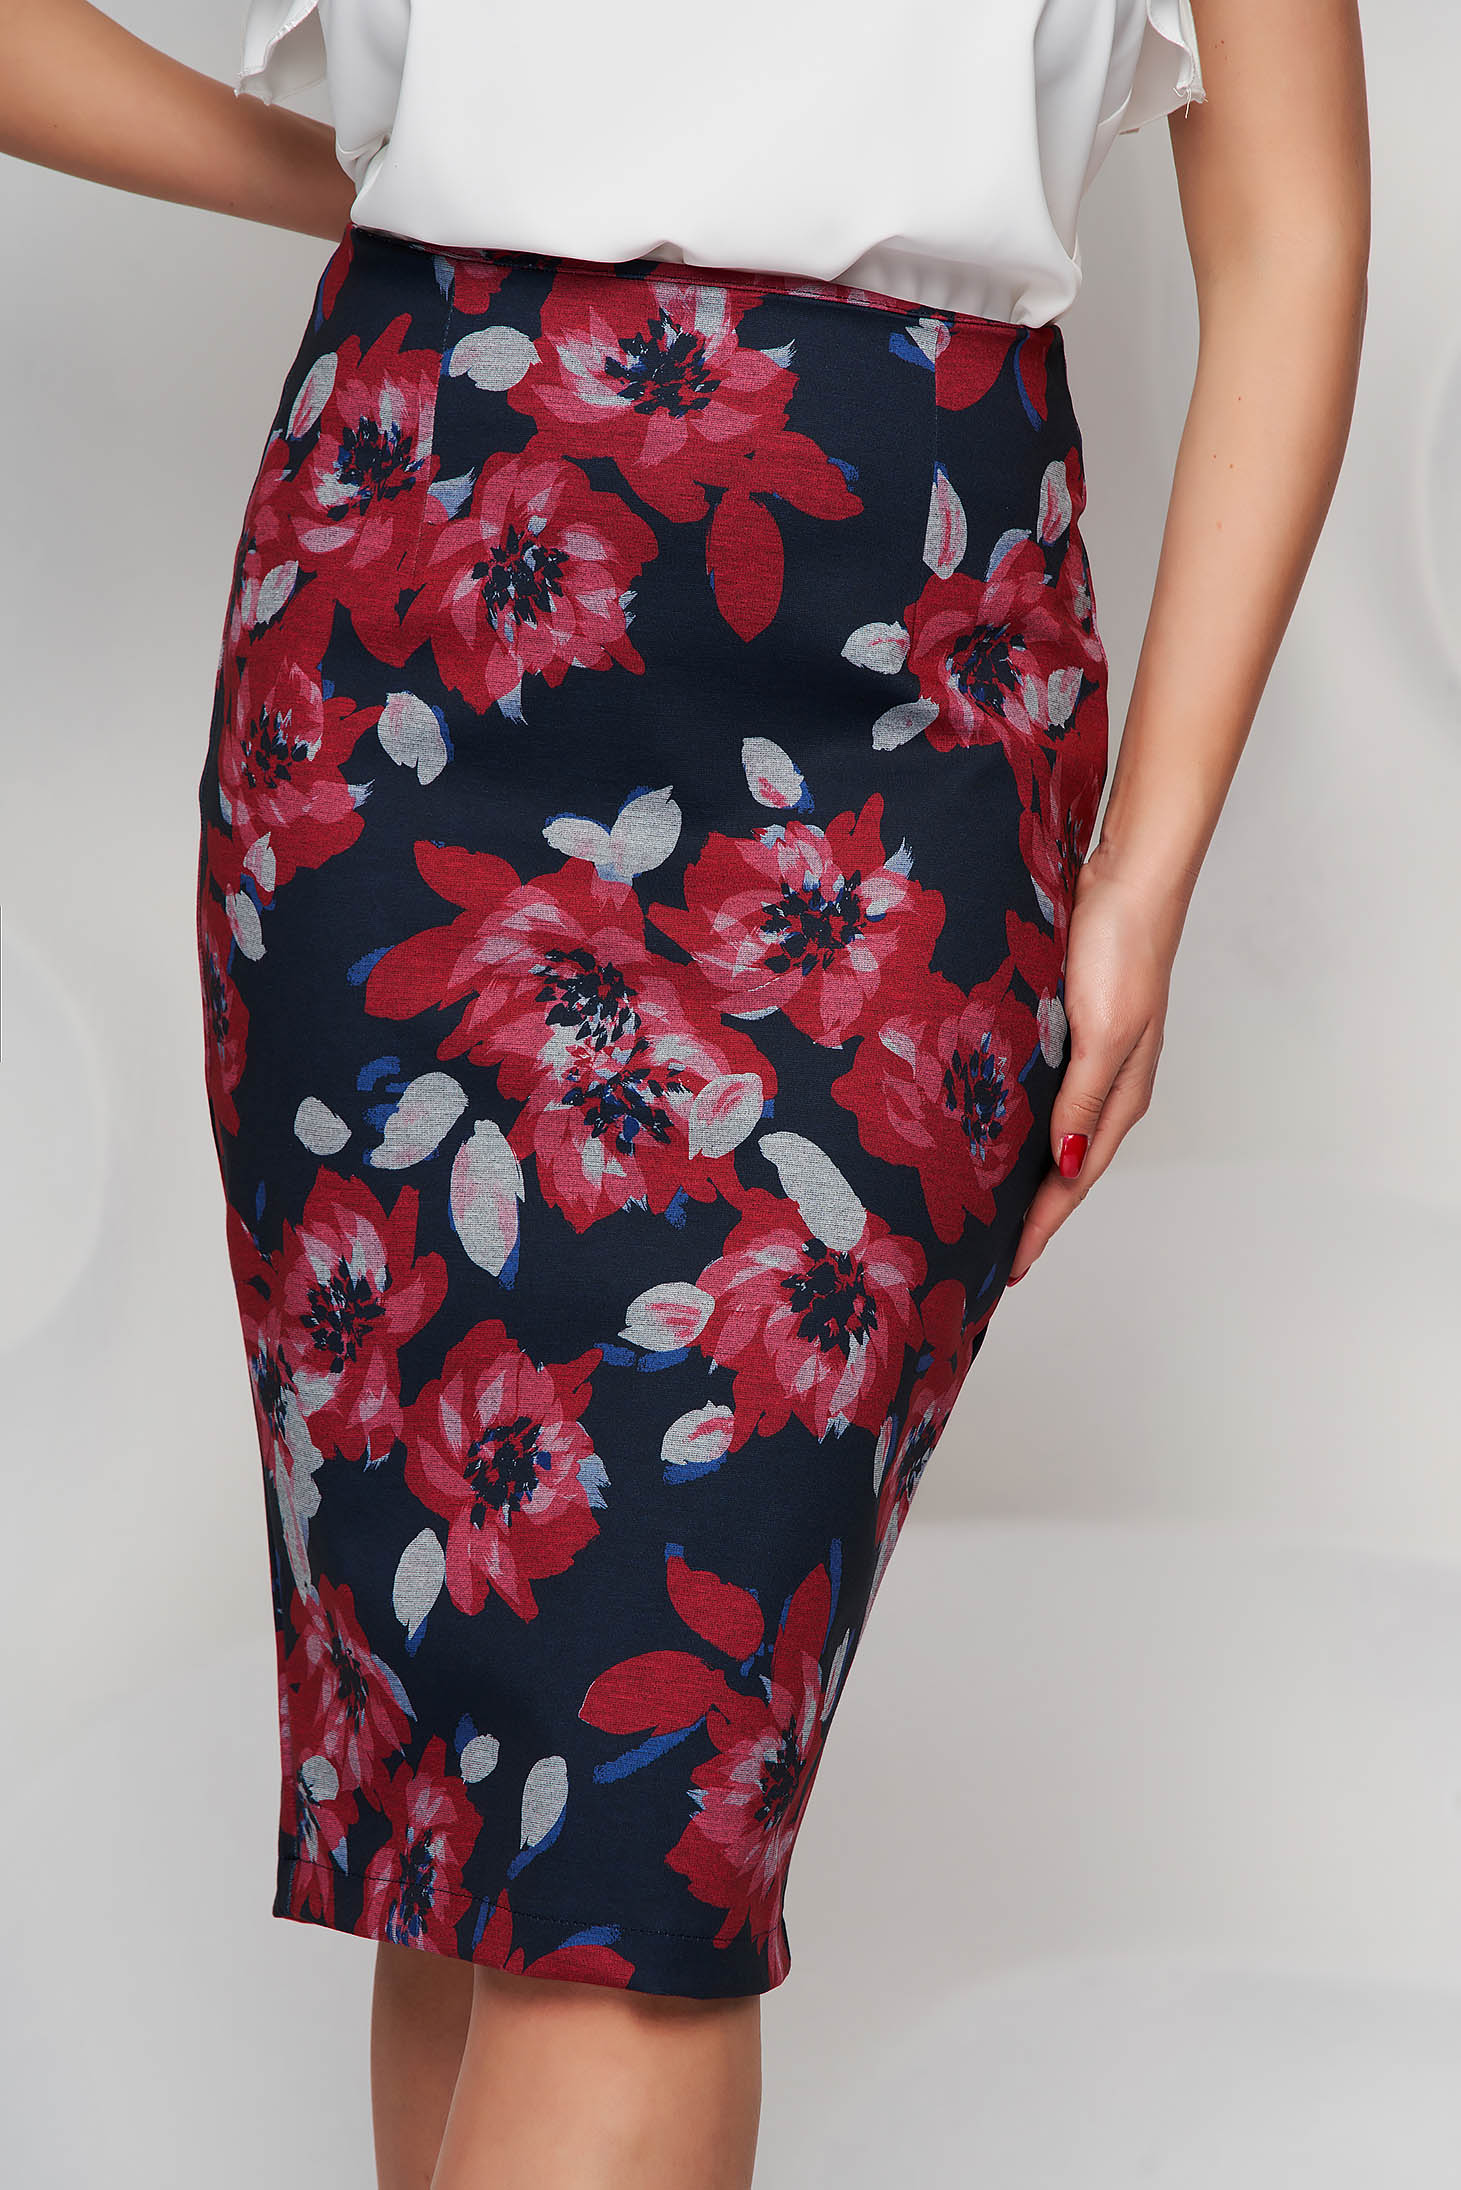 Skirt pencil midi StarShinerS office cloth from elastic fabric